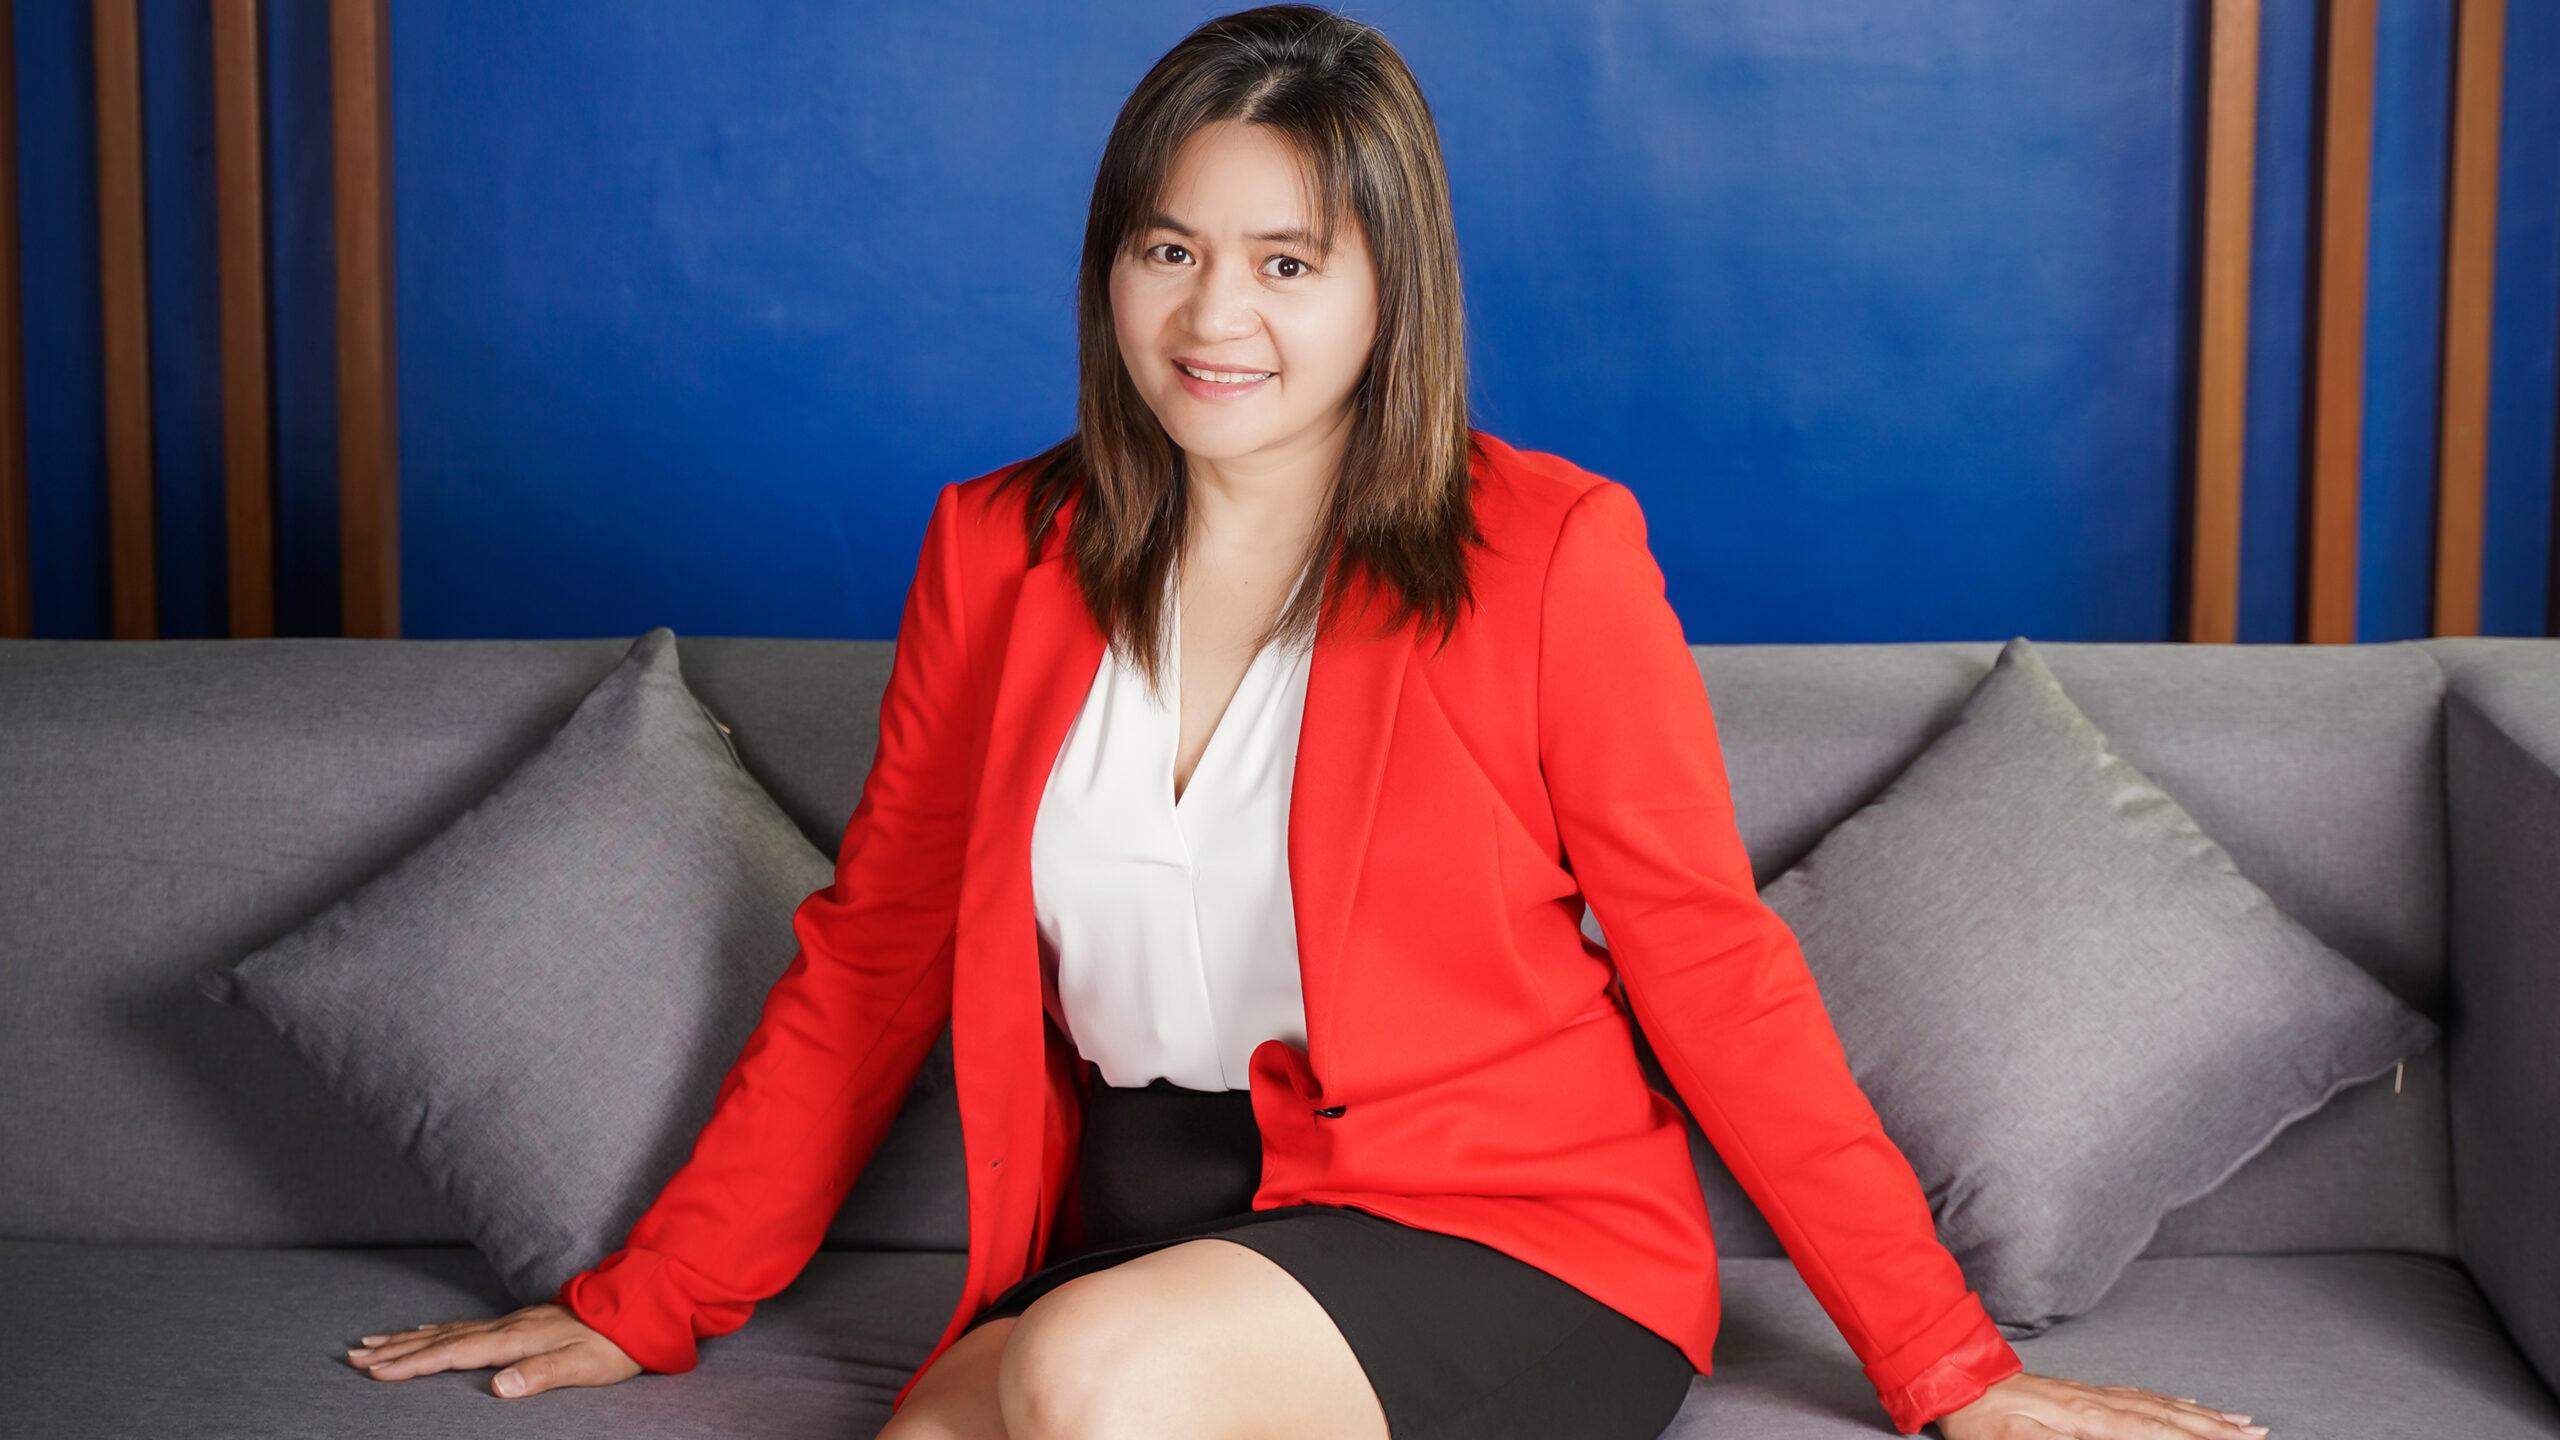 Kapampangan Female Banker is New RBAP President